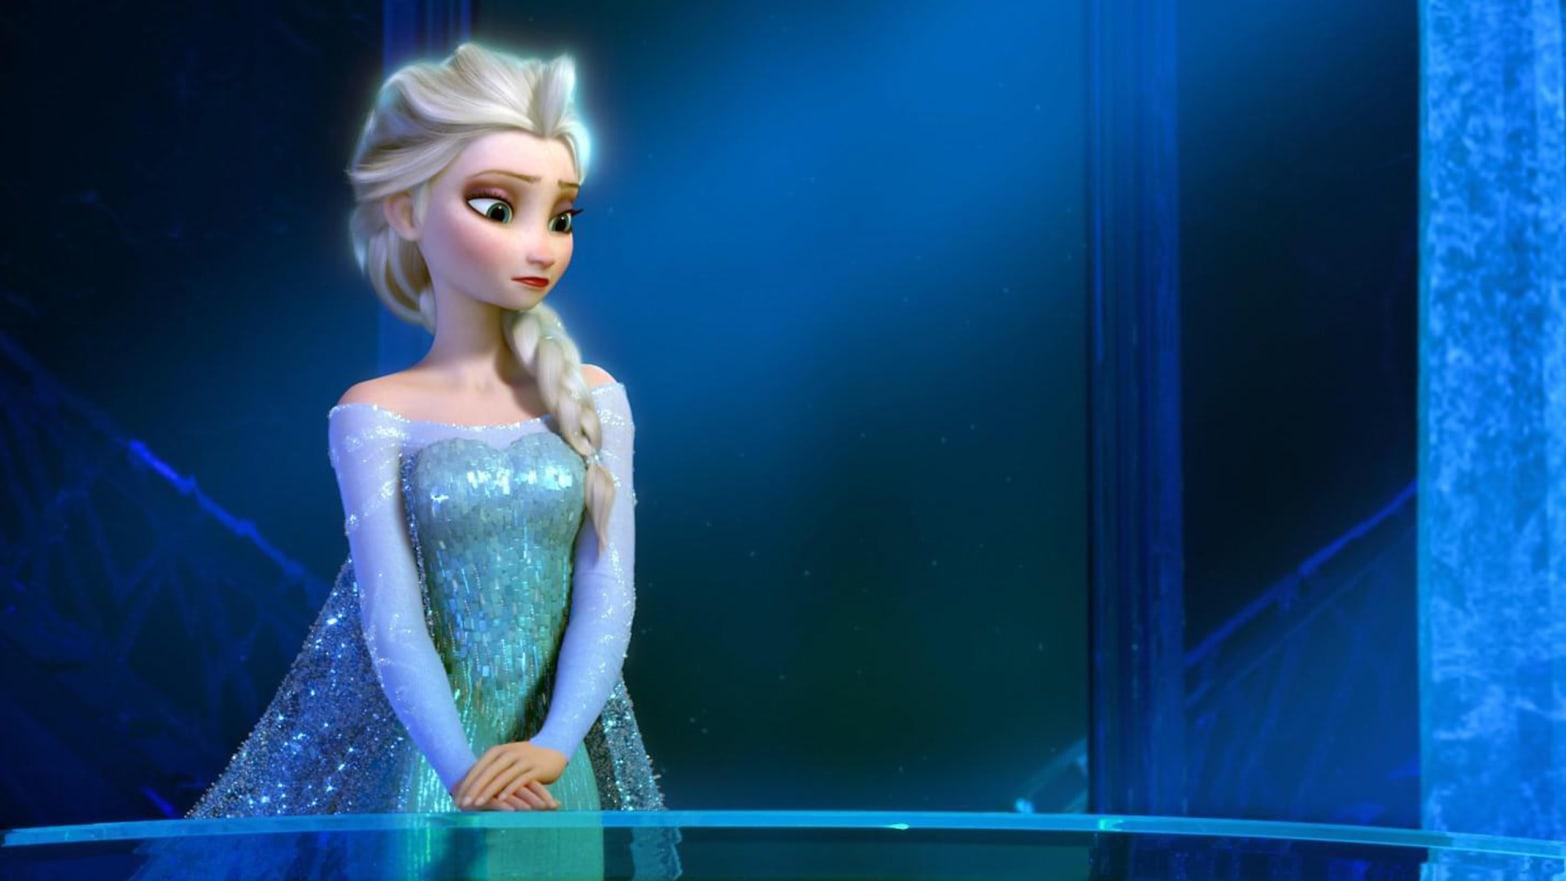 Sono Jack e Elsa dating